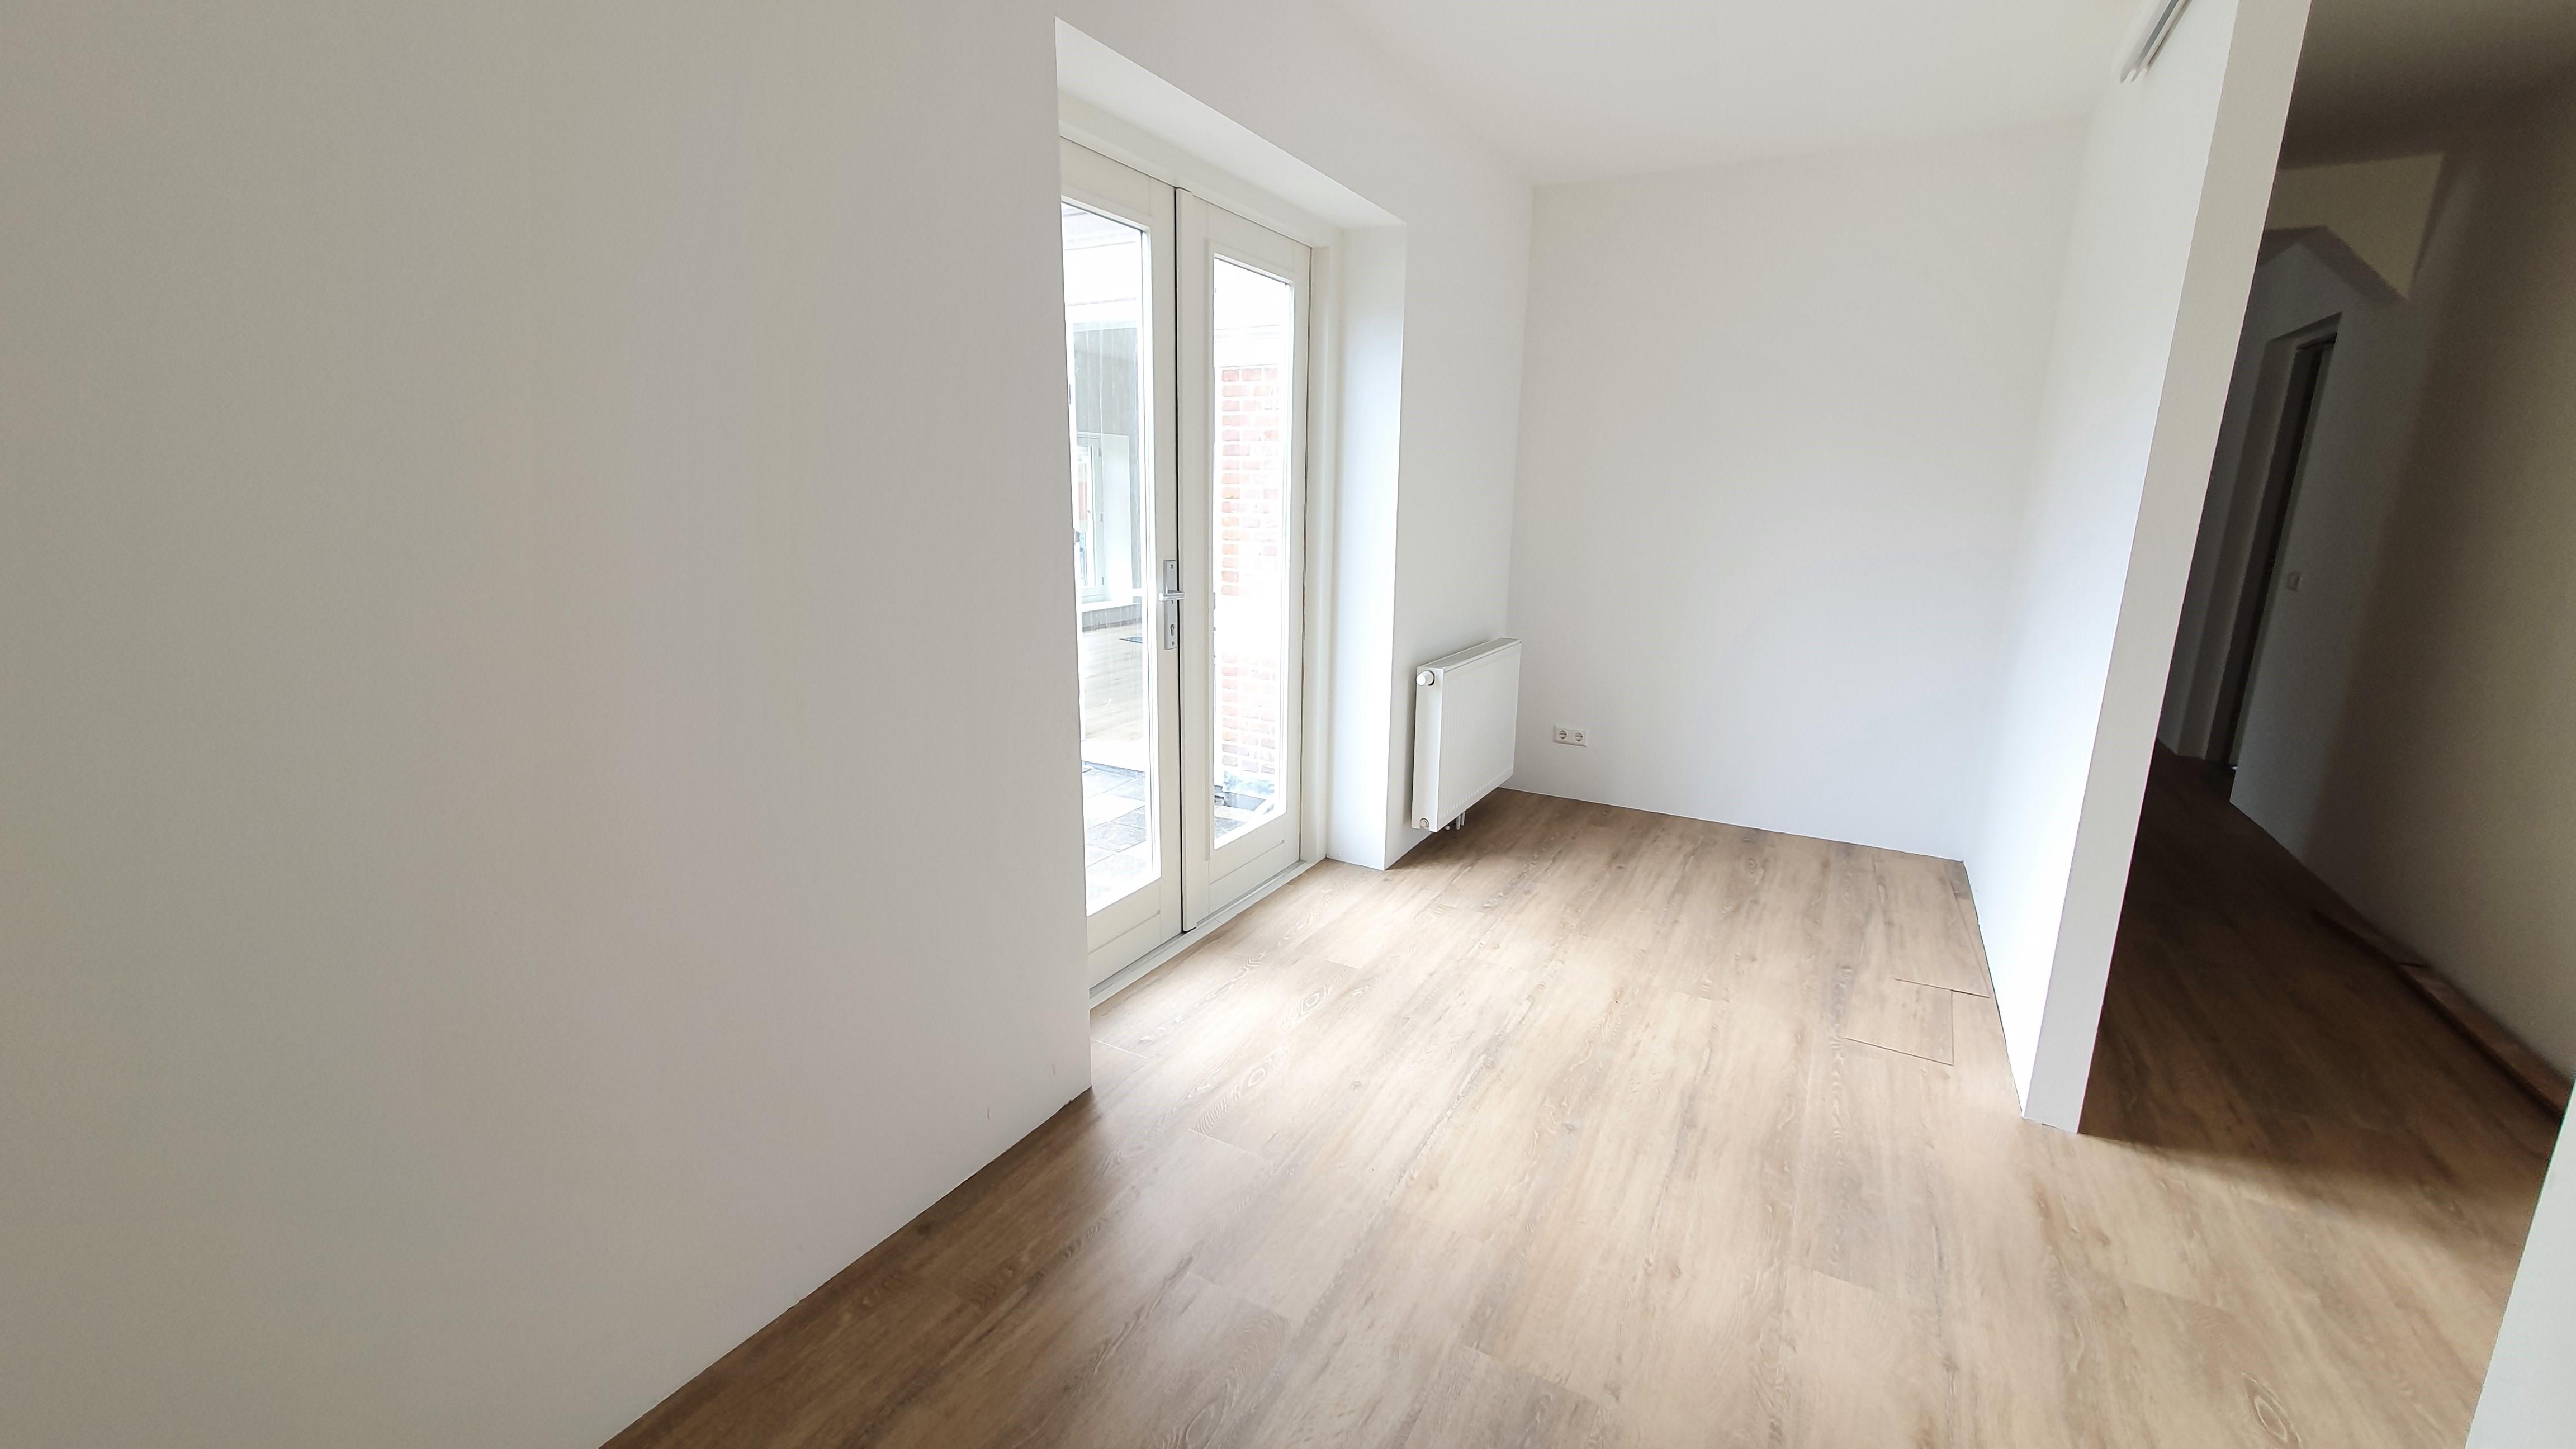 Te huur: Appartement Achter de Arnhemse Poortwal, Amersfoort - 6